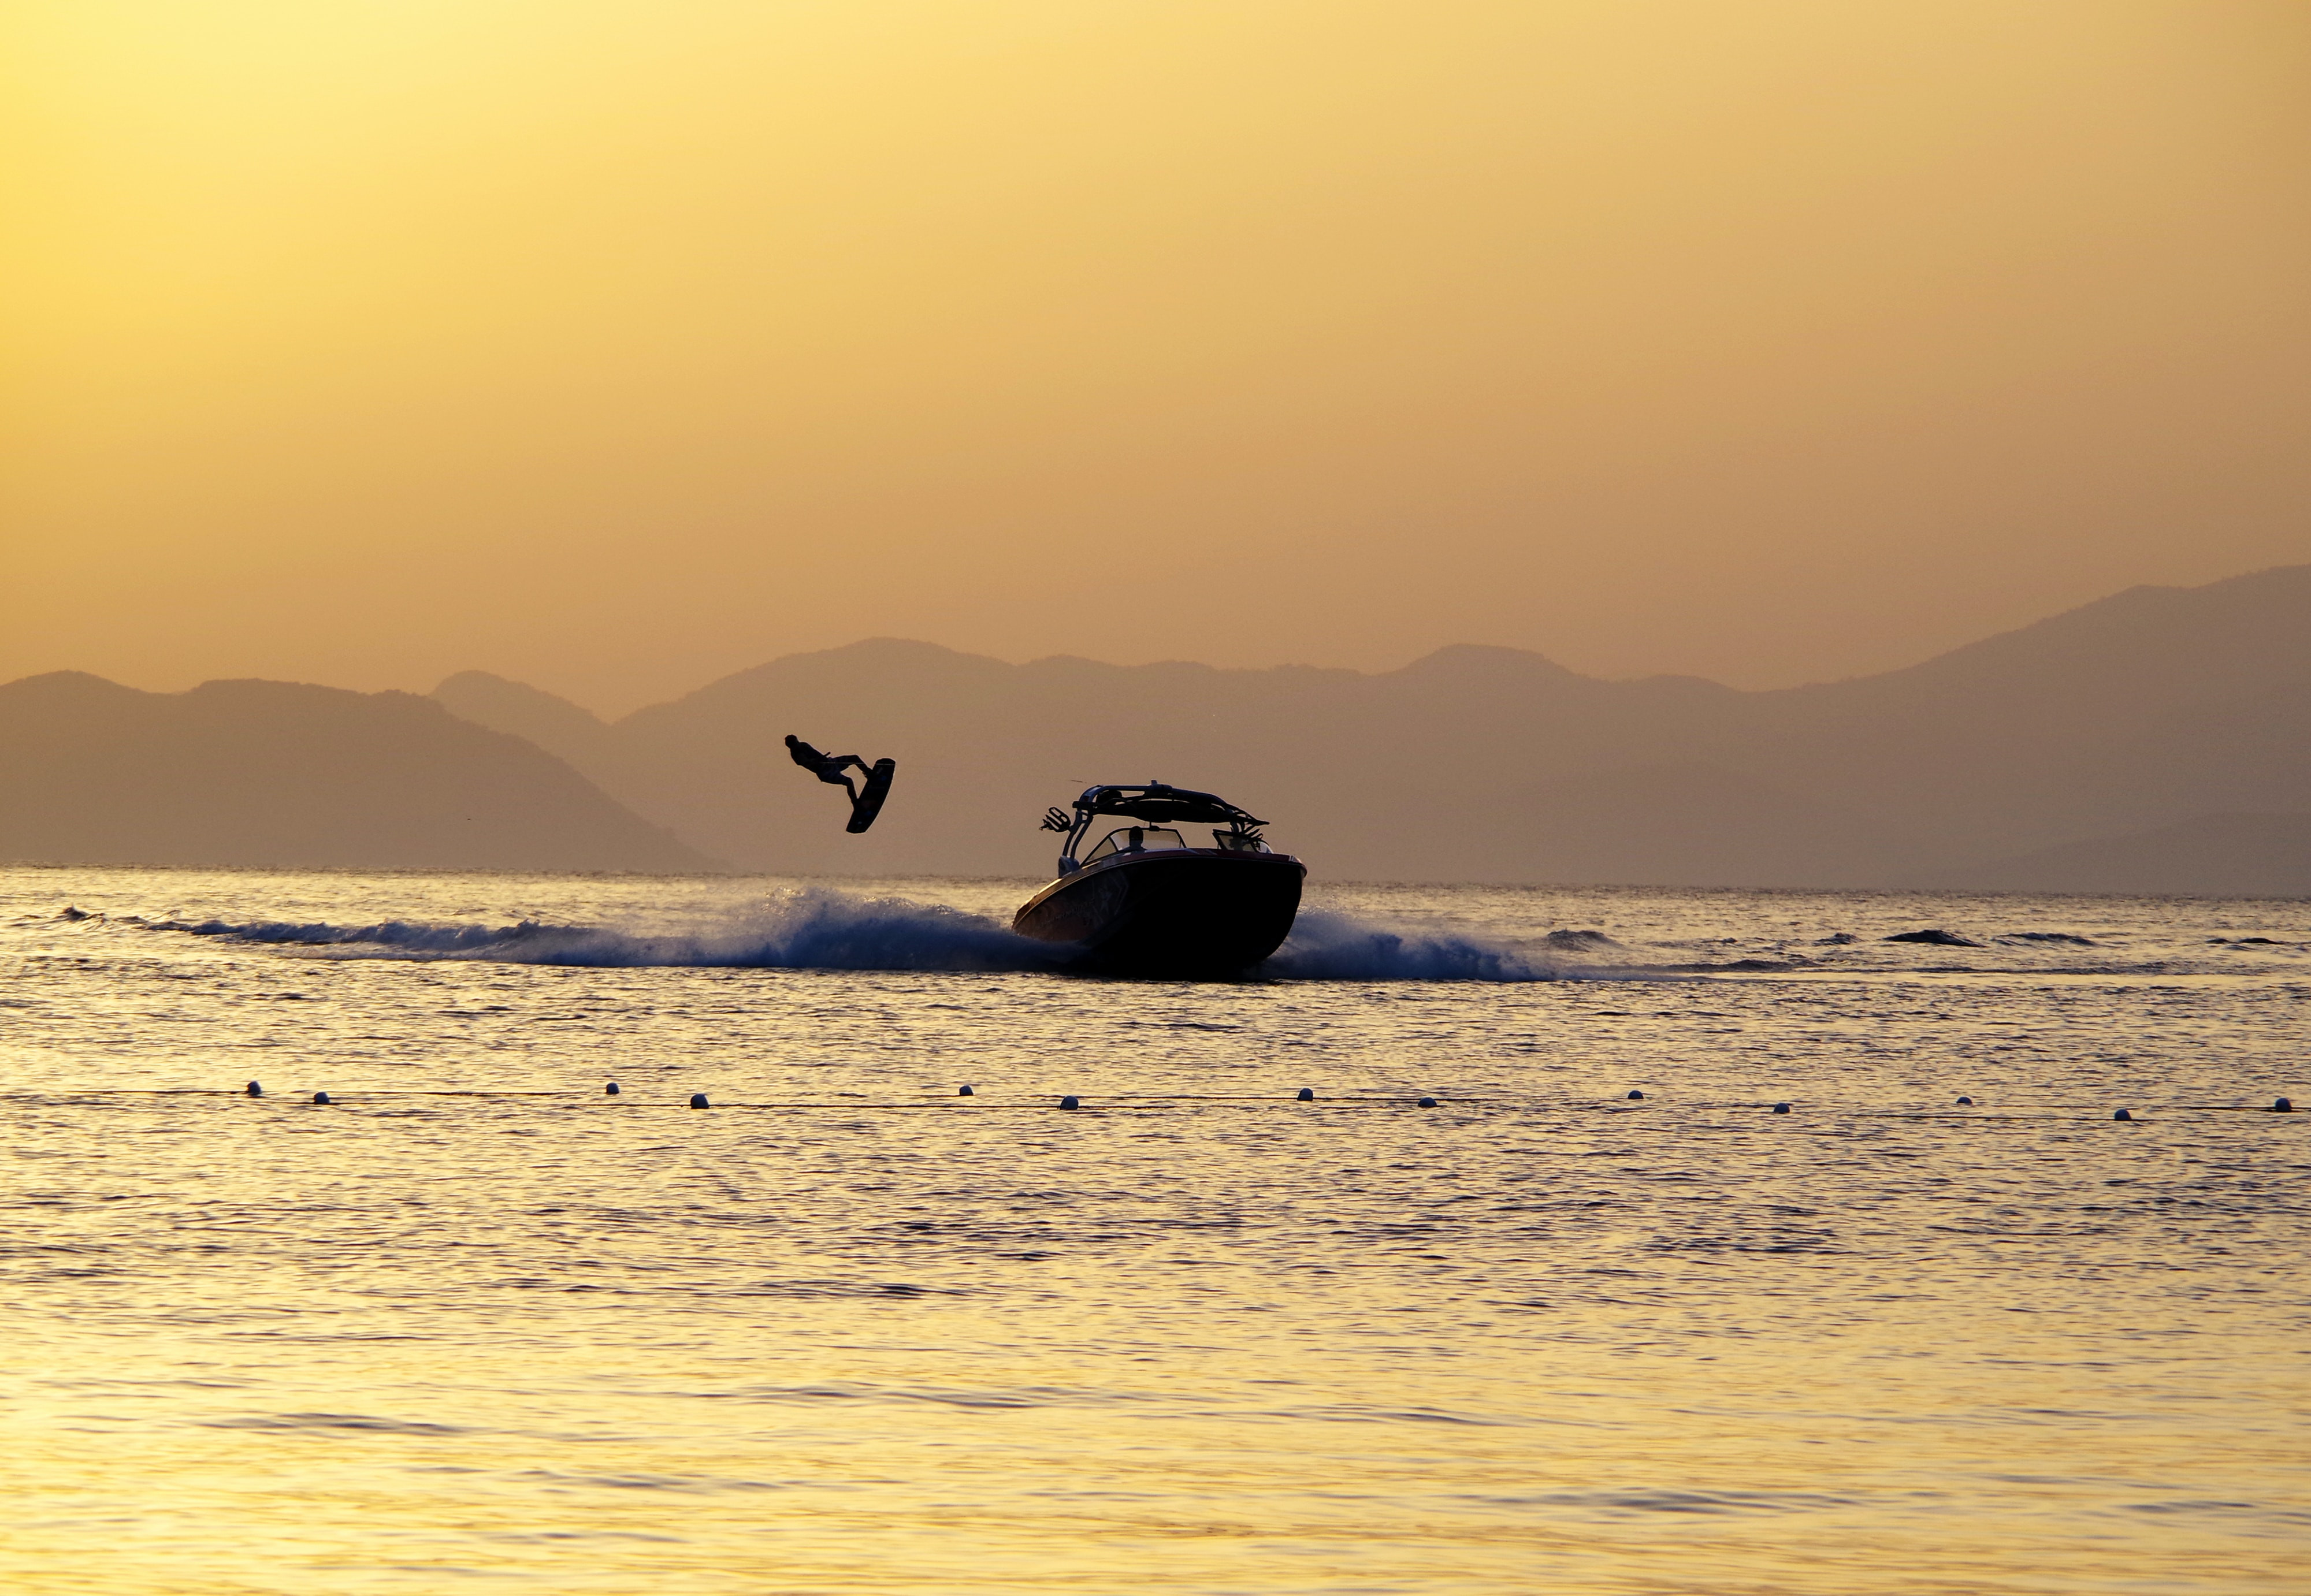 1/2 Day Boat Rental